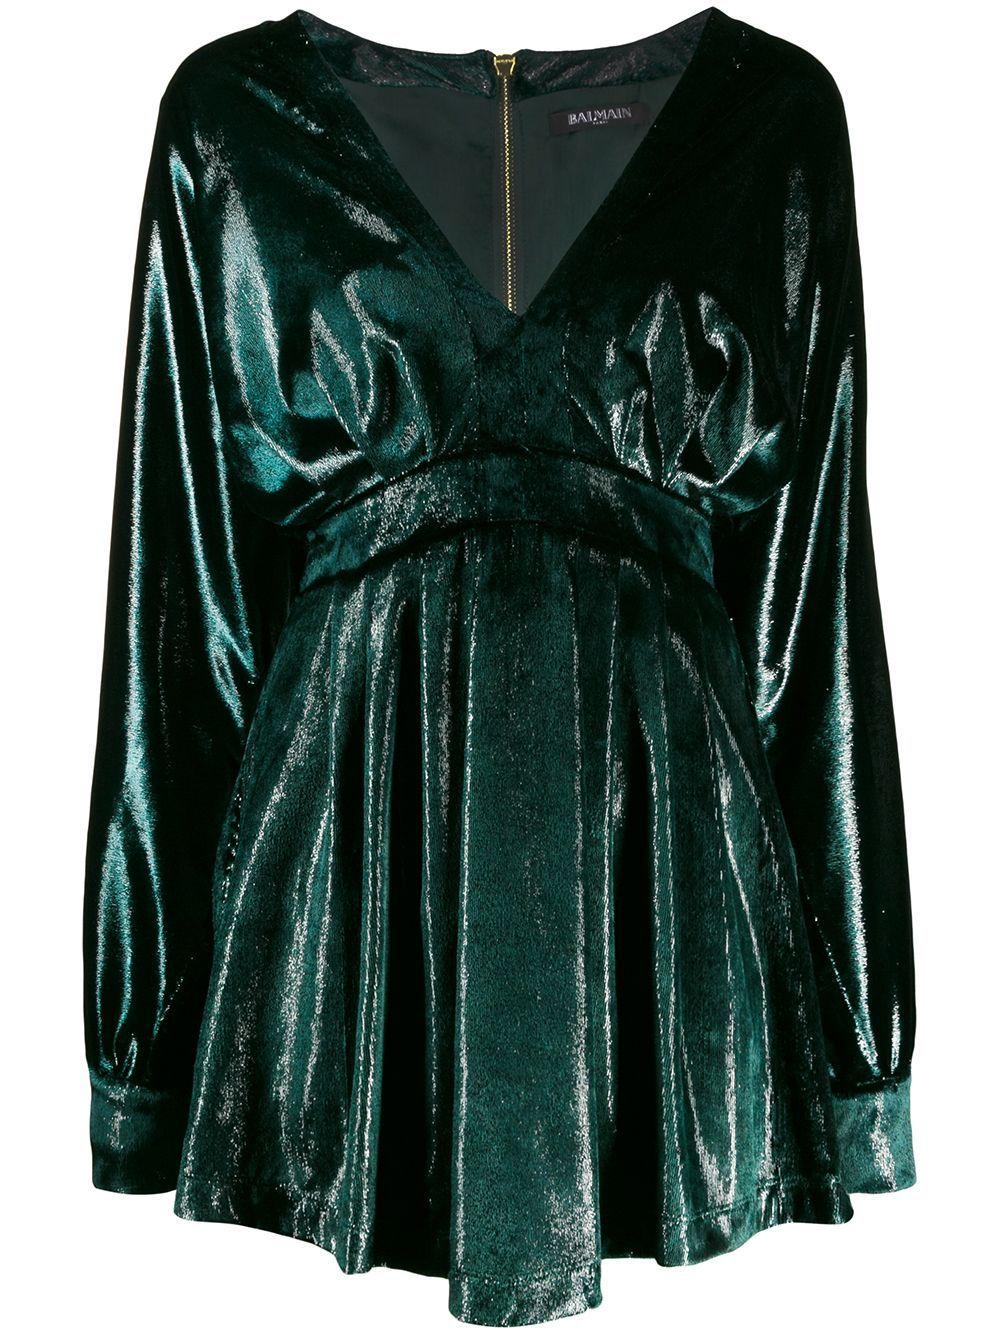 Pin By Paulina Verduzco Lopez On Slytherin In 2020 Dresses Velour Dress Flare Dress [ 1334 x 1000 Pixel ]